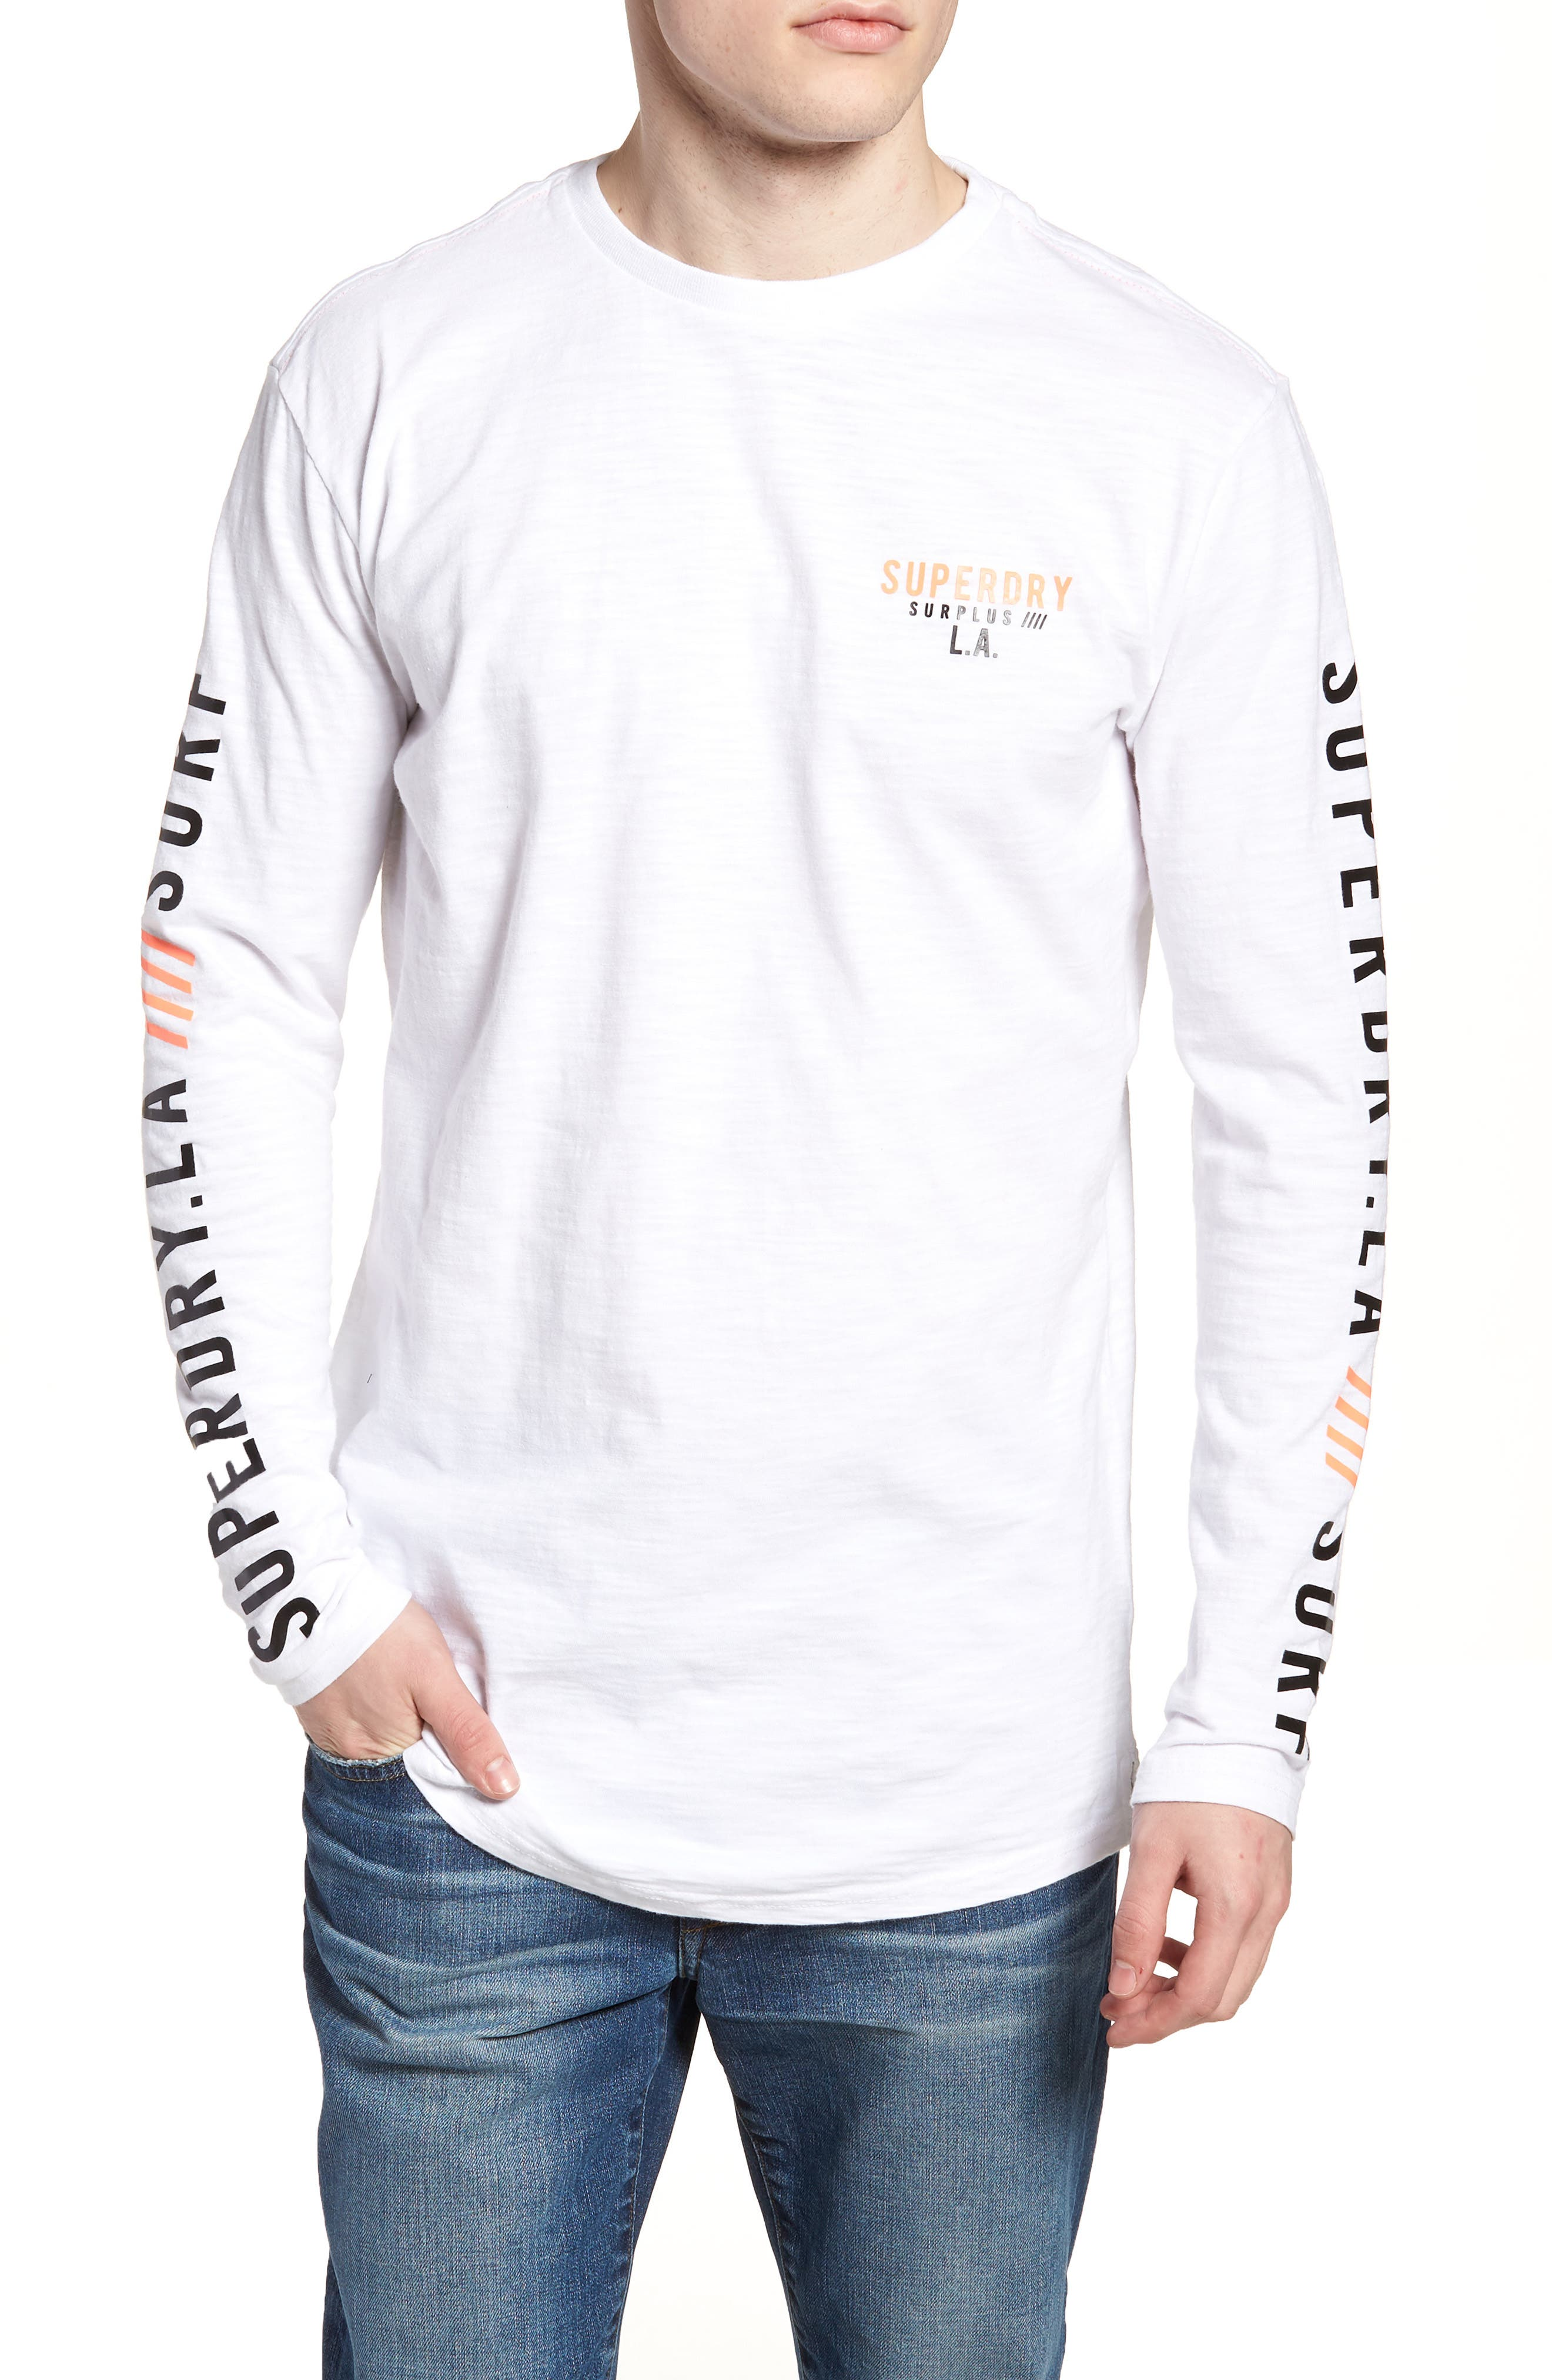 Alternate Image 1 Selected - Superdry Surplus Goods T-Shirt